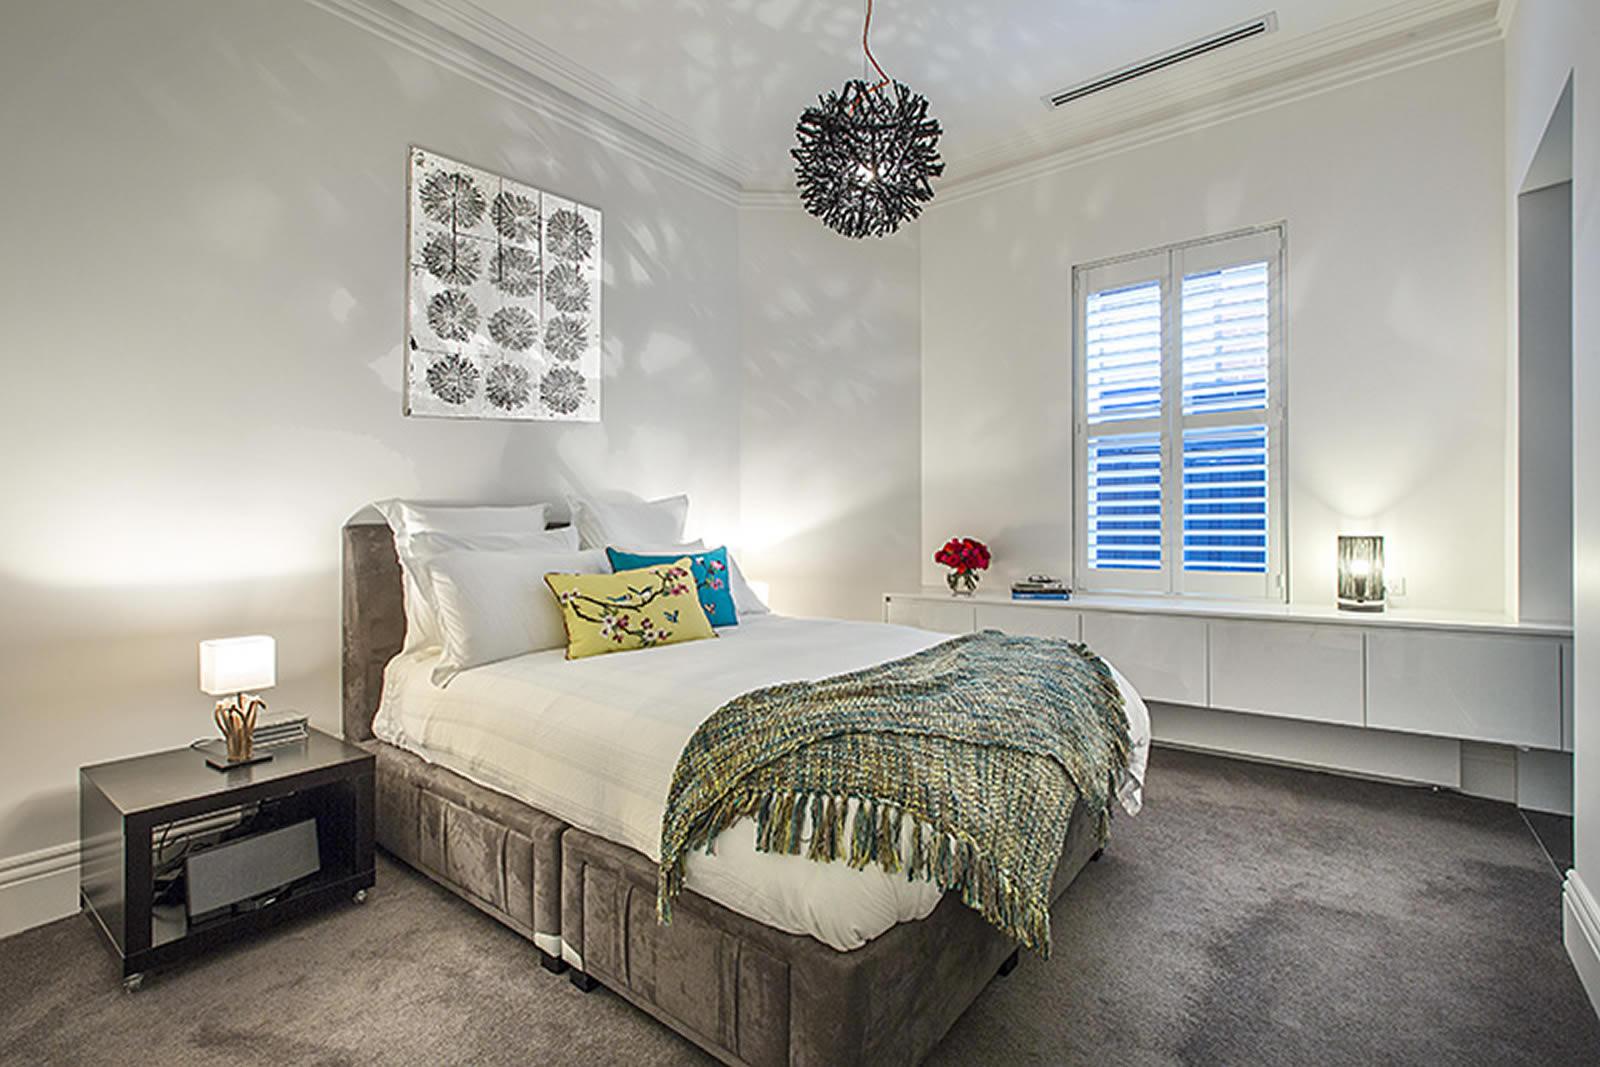 Bespoke Bedrooms & Robes